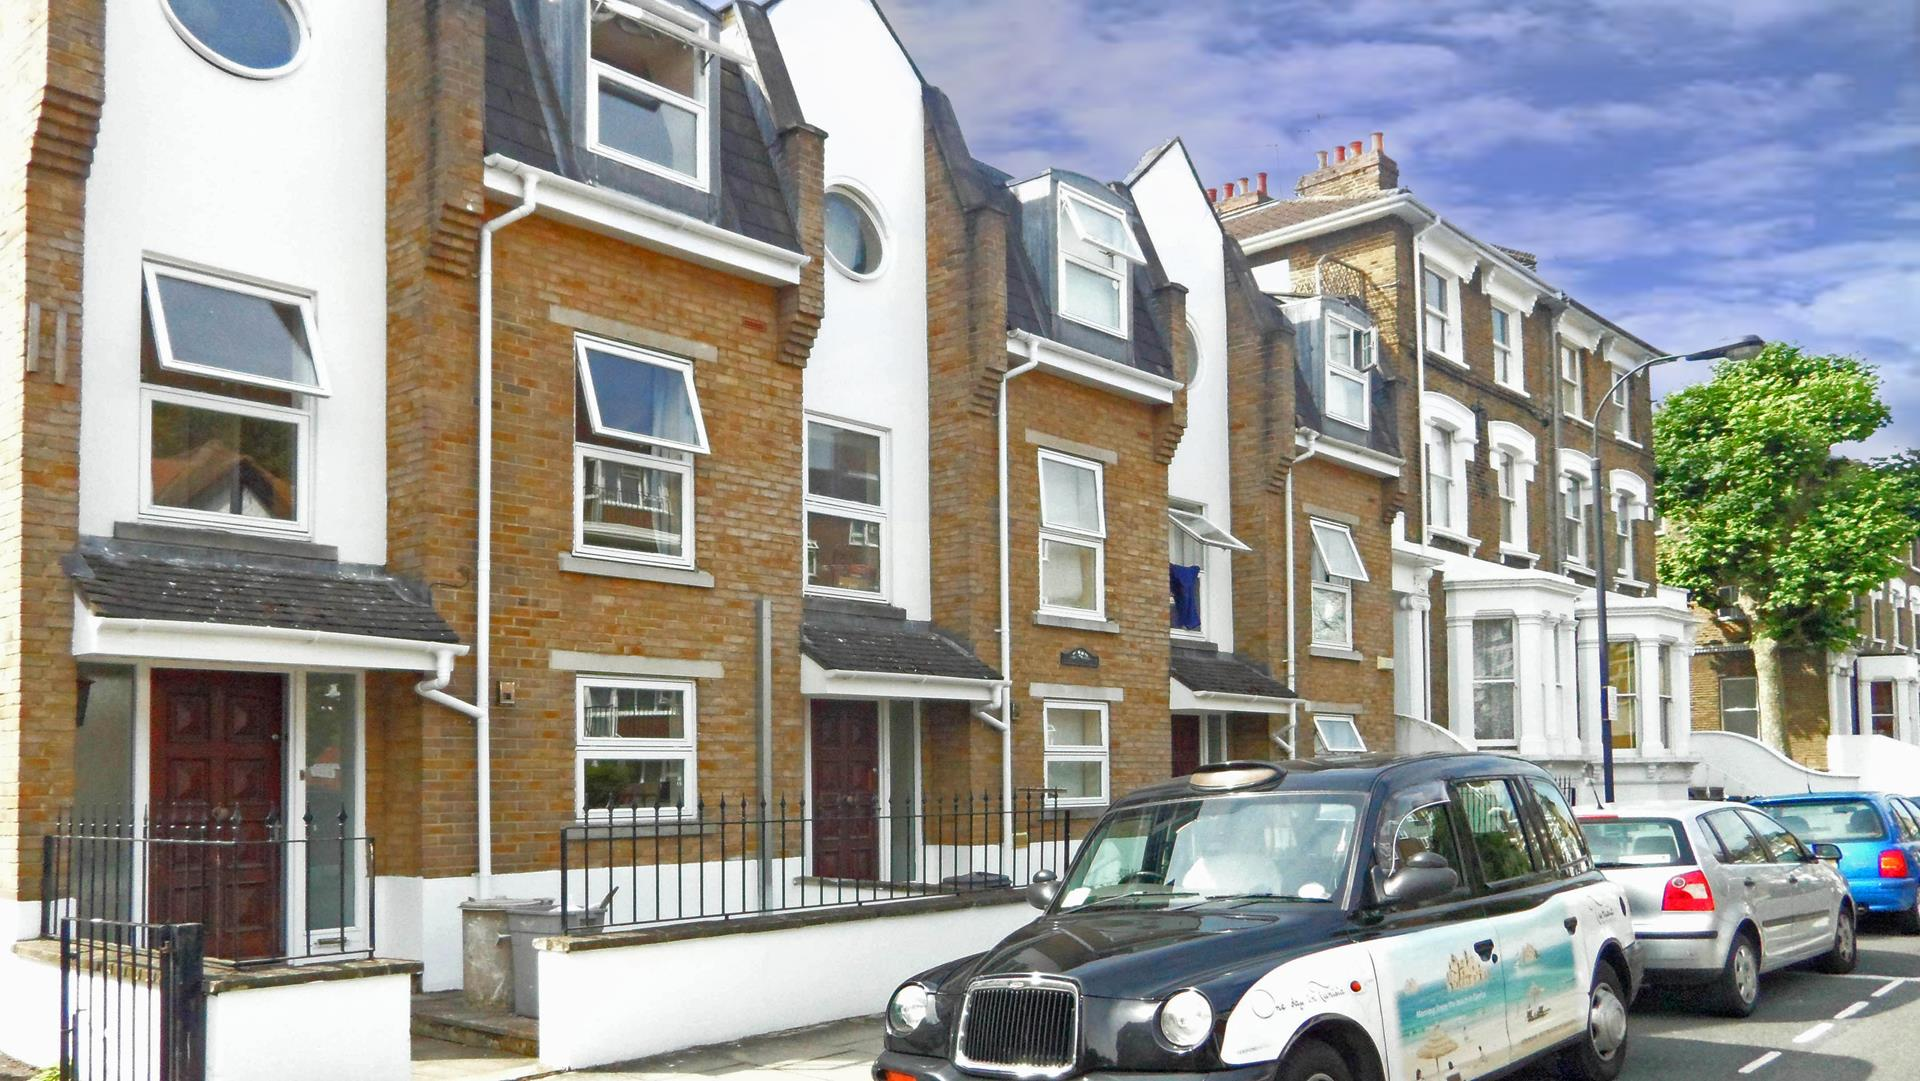 7 Bedrooms House To Let In Portland Villas London W6 Broadway West